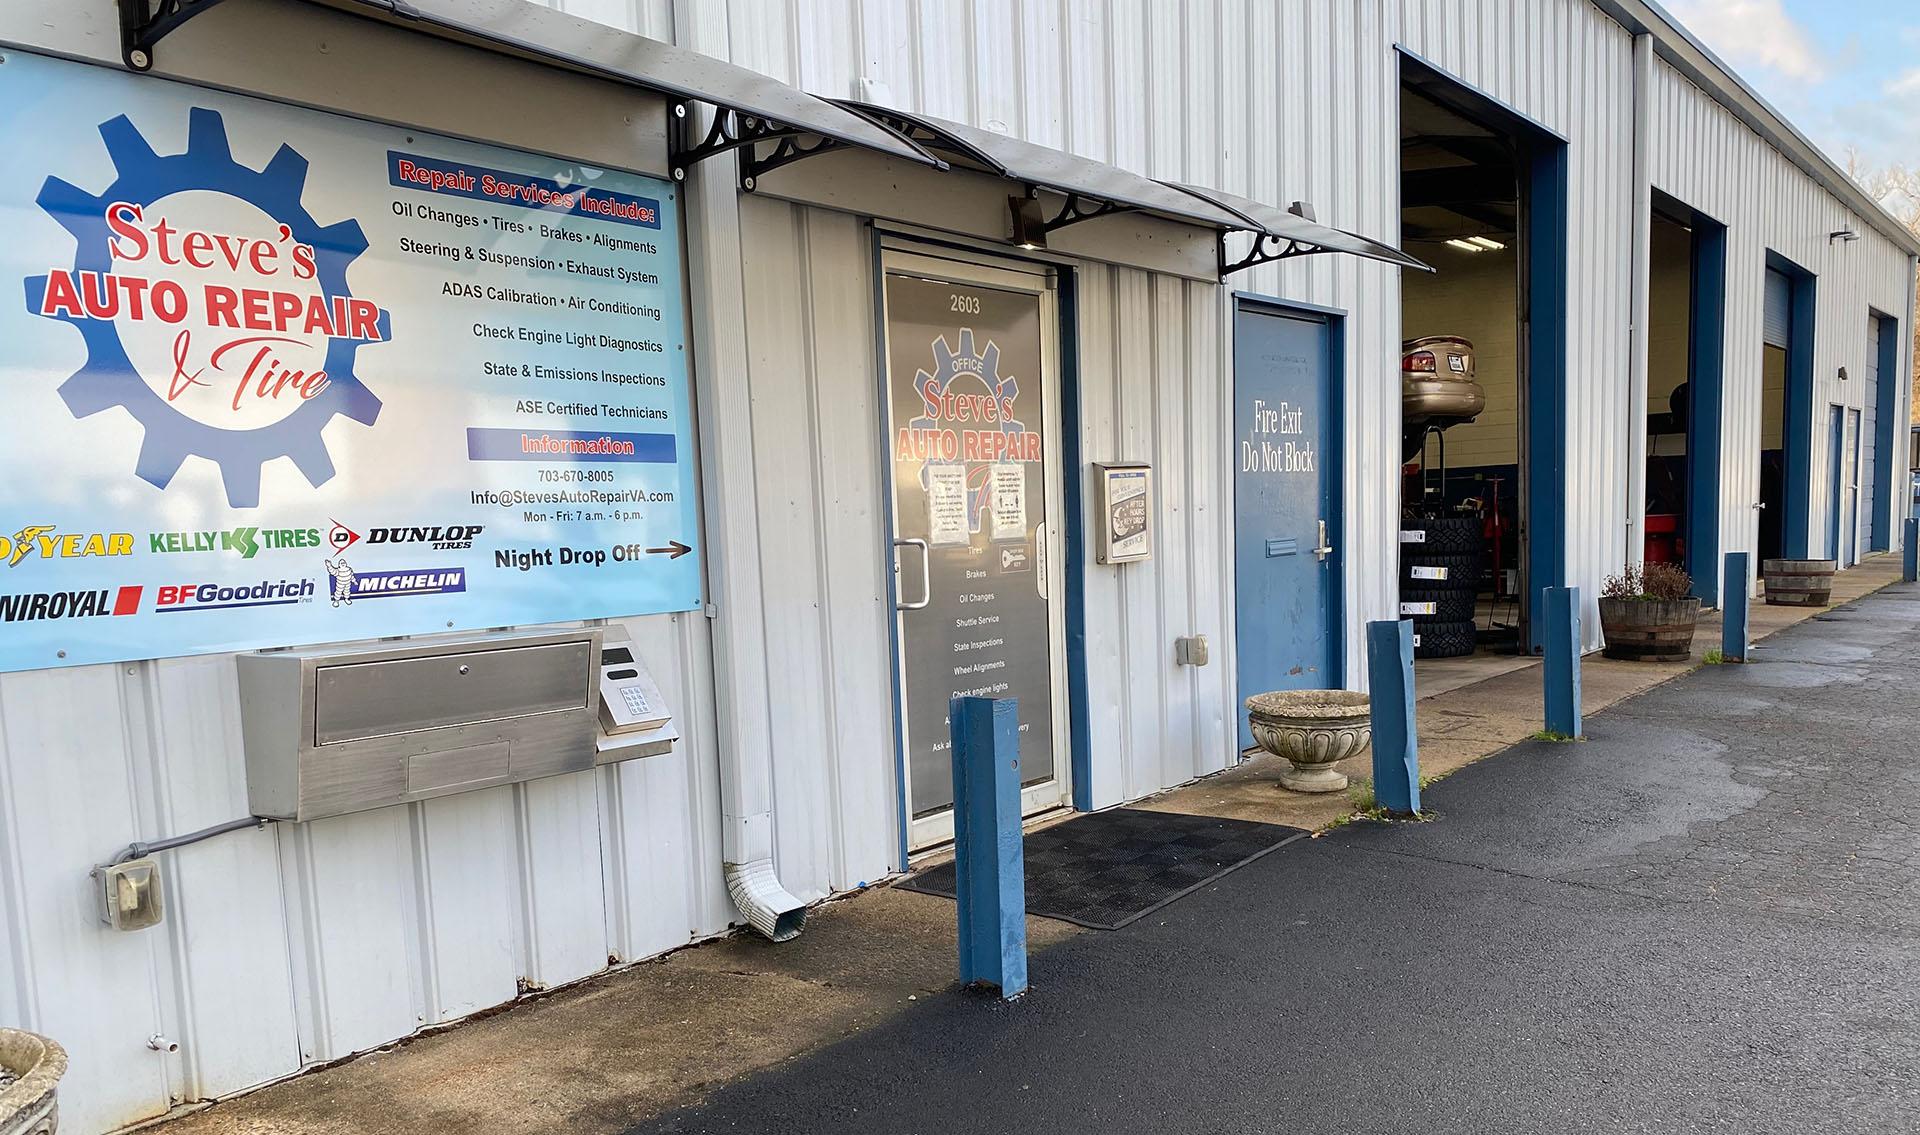 Tax deadline extended for businesses